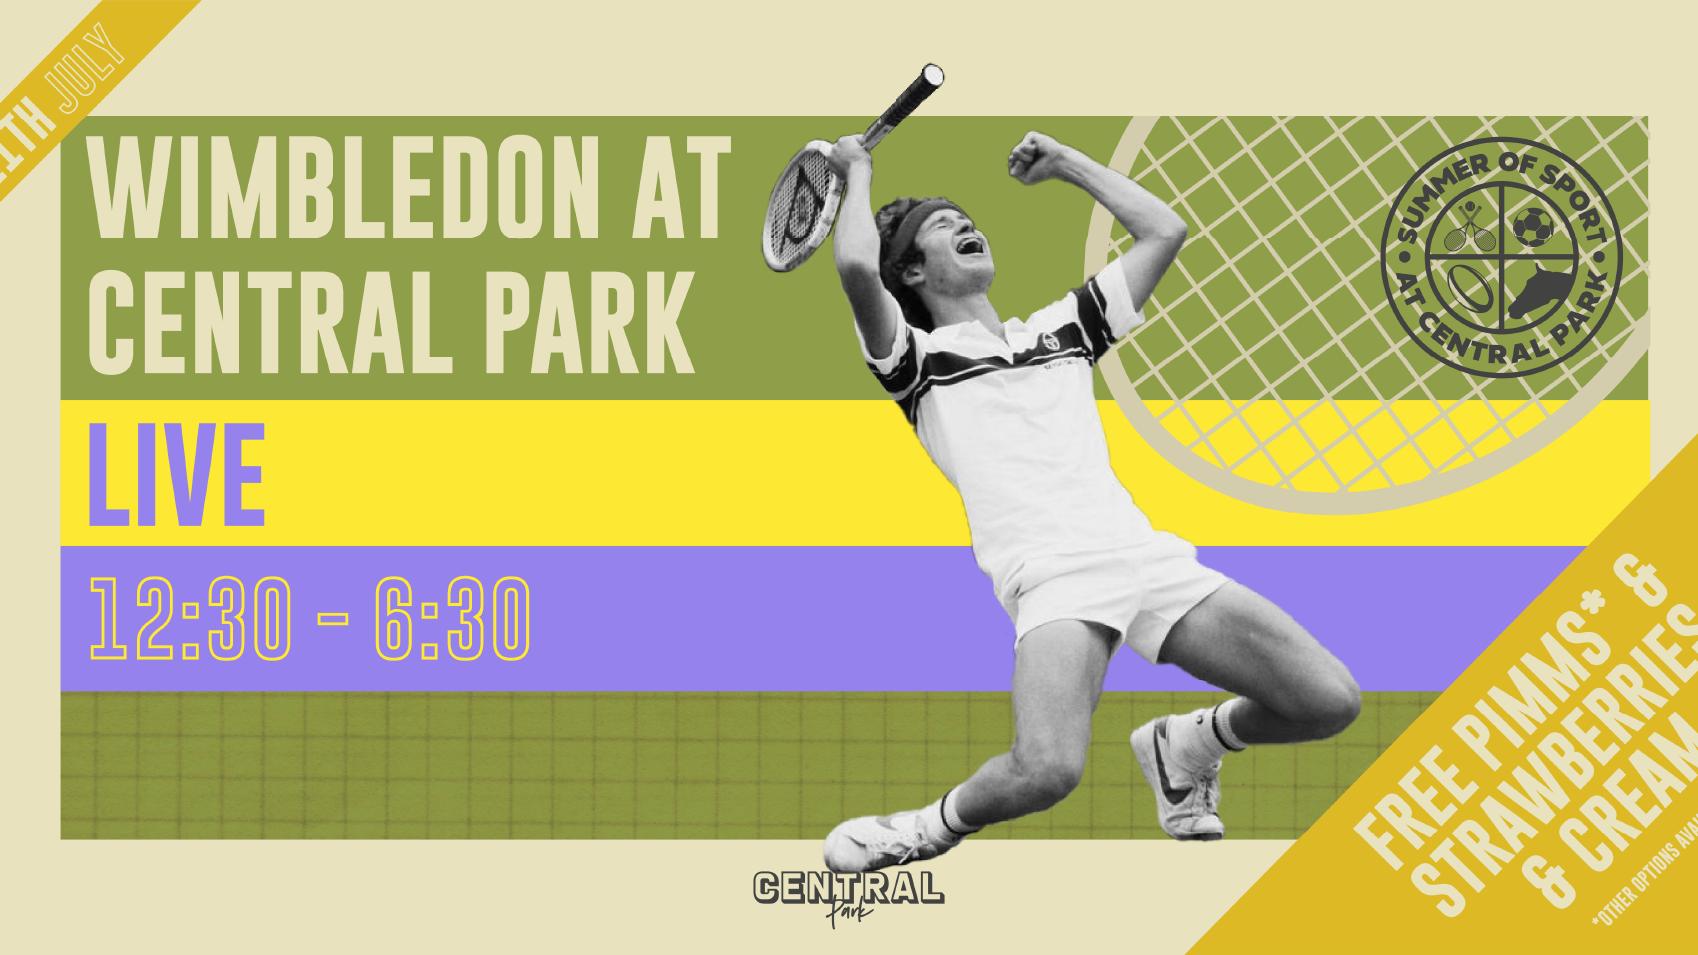 Wimbledon 2021 – Live at Central Park